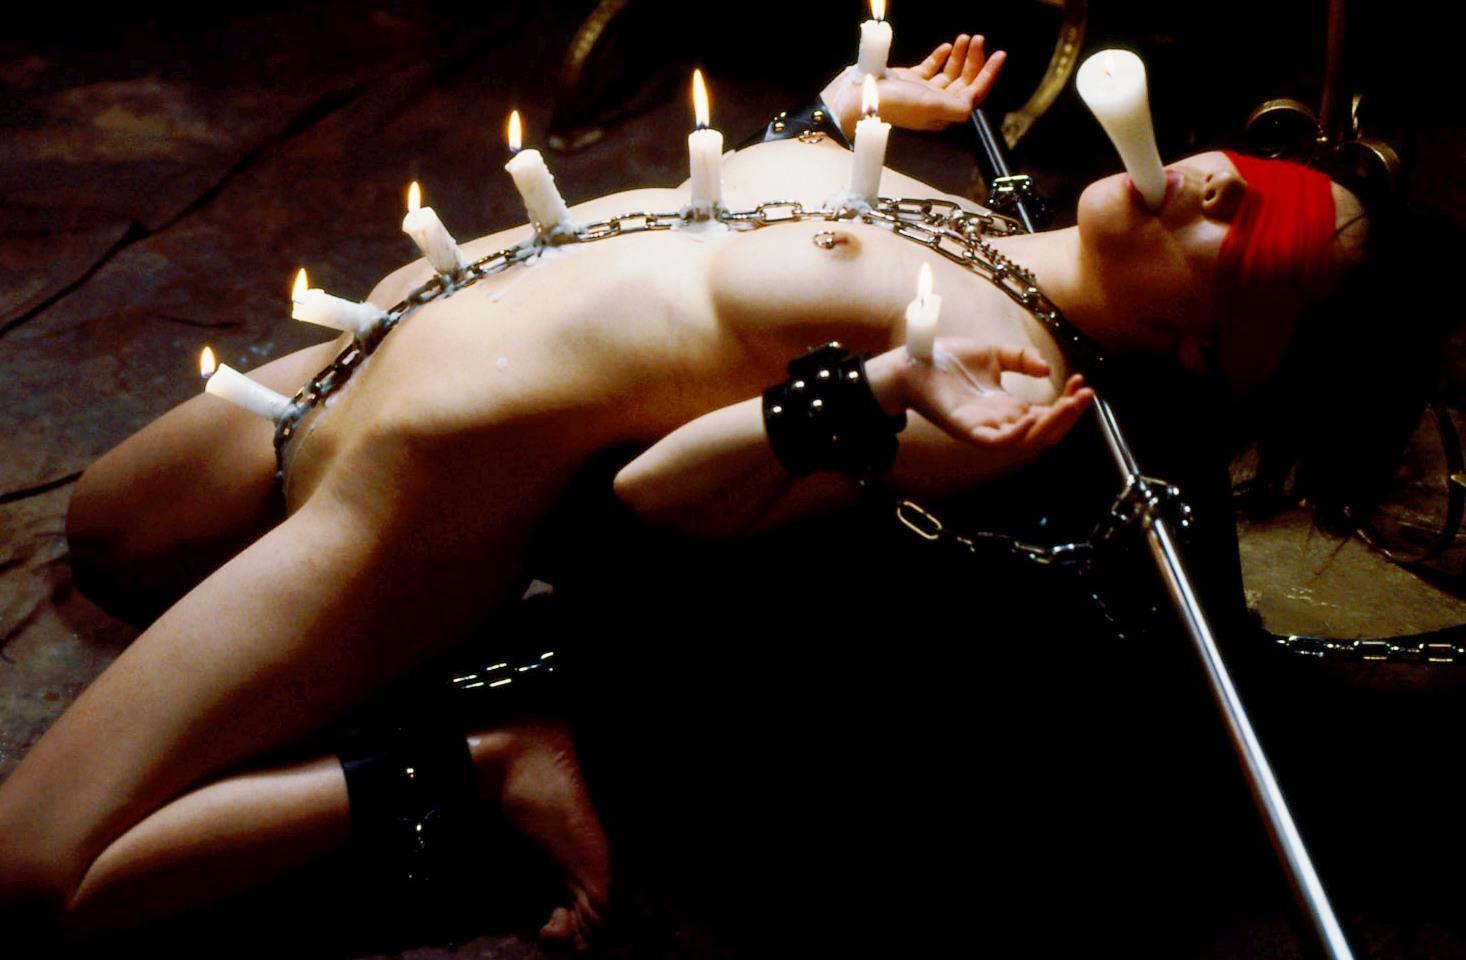 【SMエロ画像】熱い!でも逃げられない…緊縛M女への熱蝋責め調教www 13